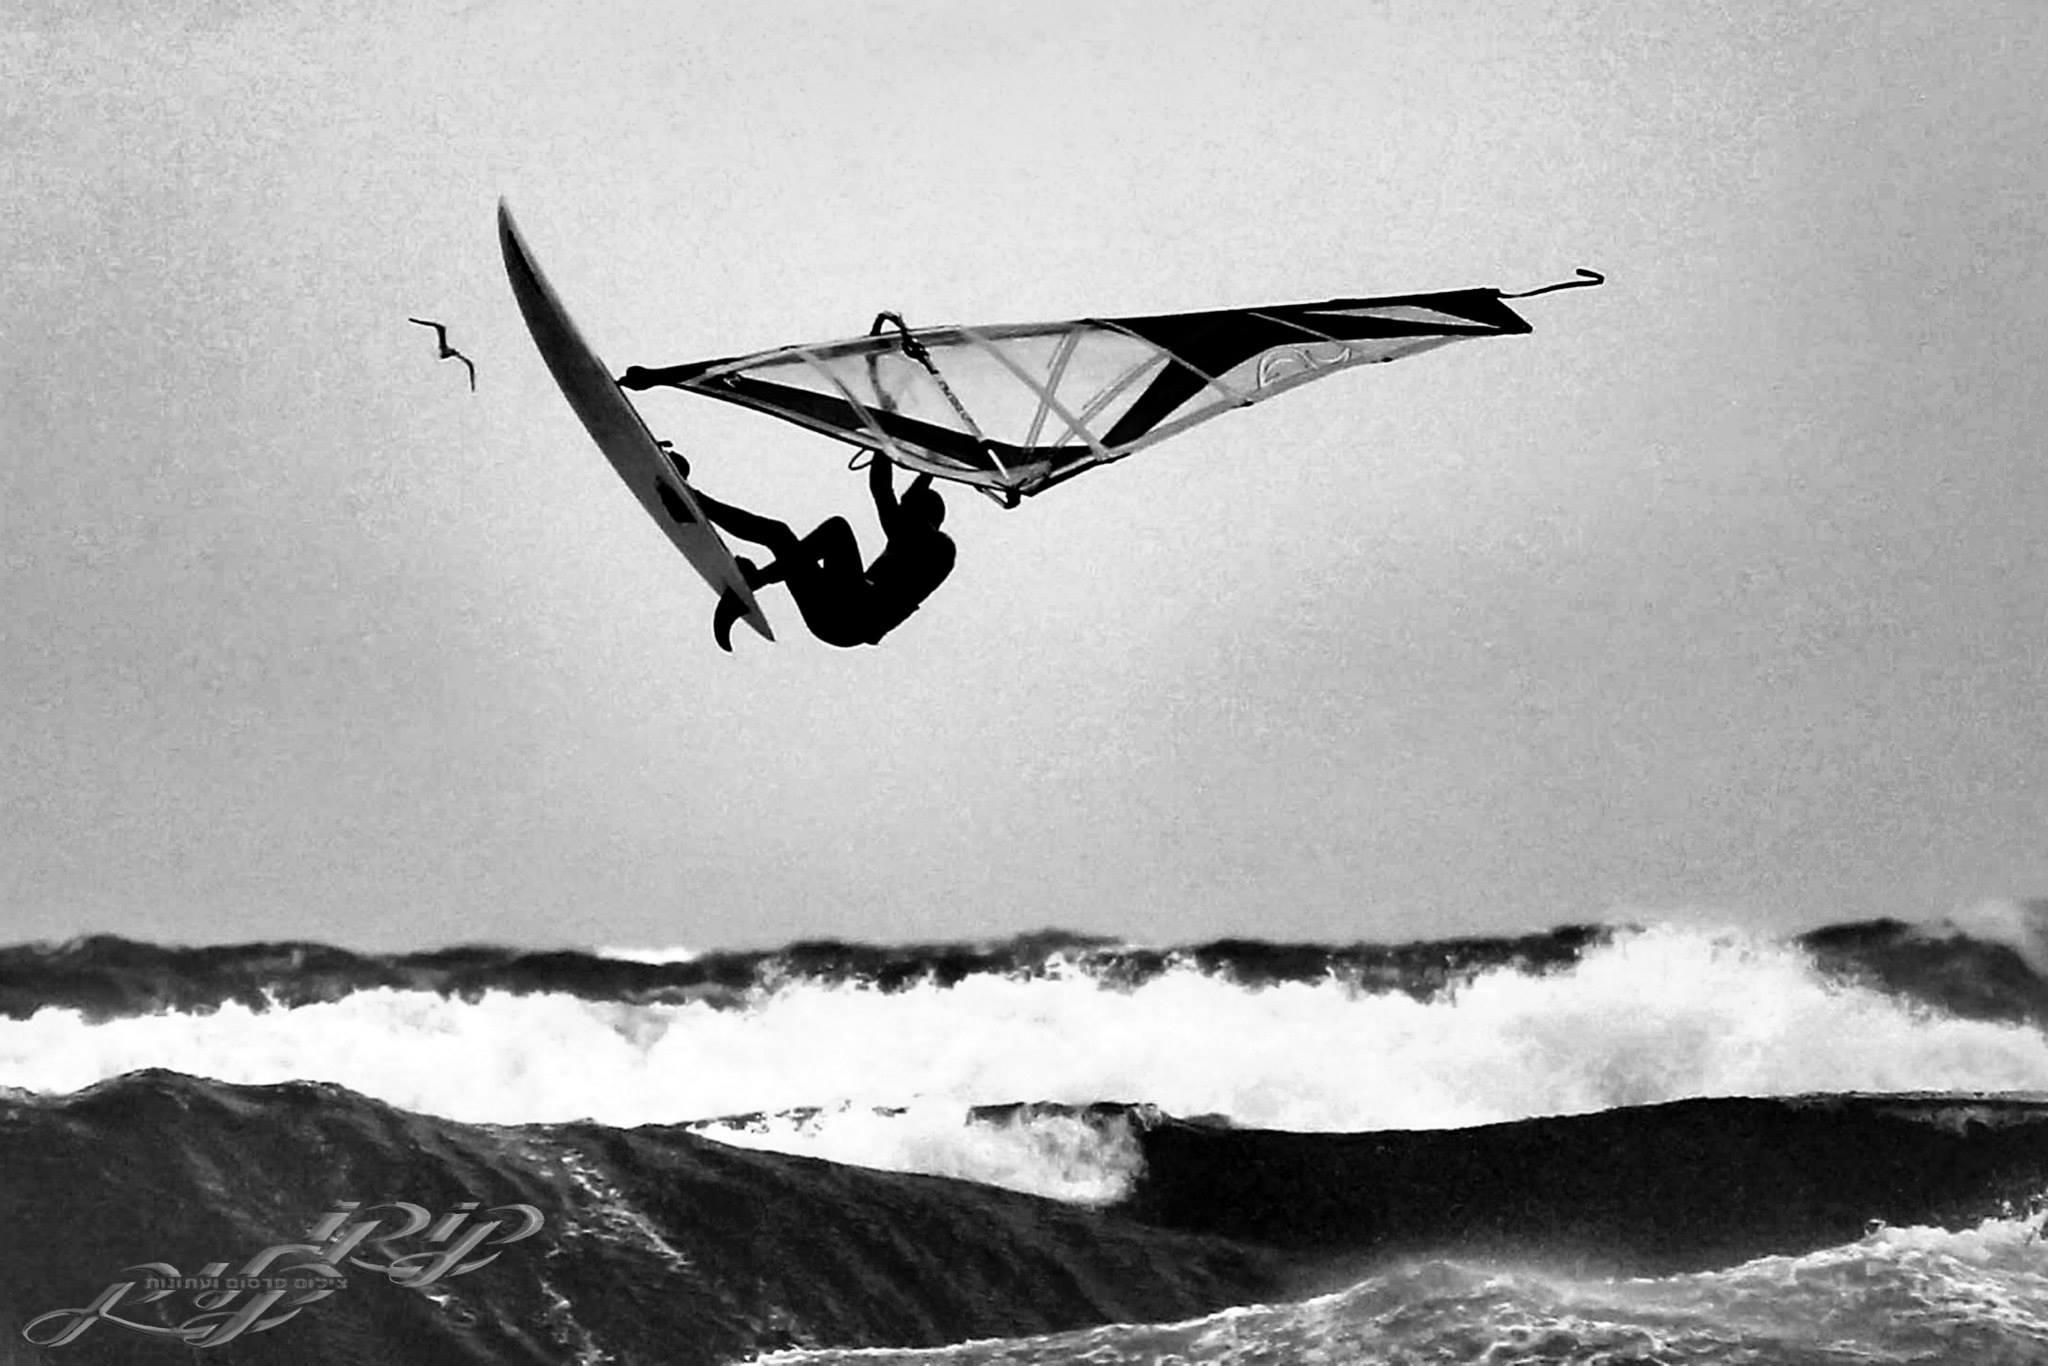 Shahar Tzuberi Olympic bronze medalist for windsurfing